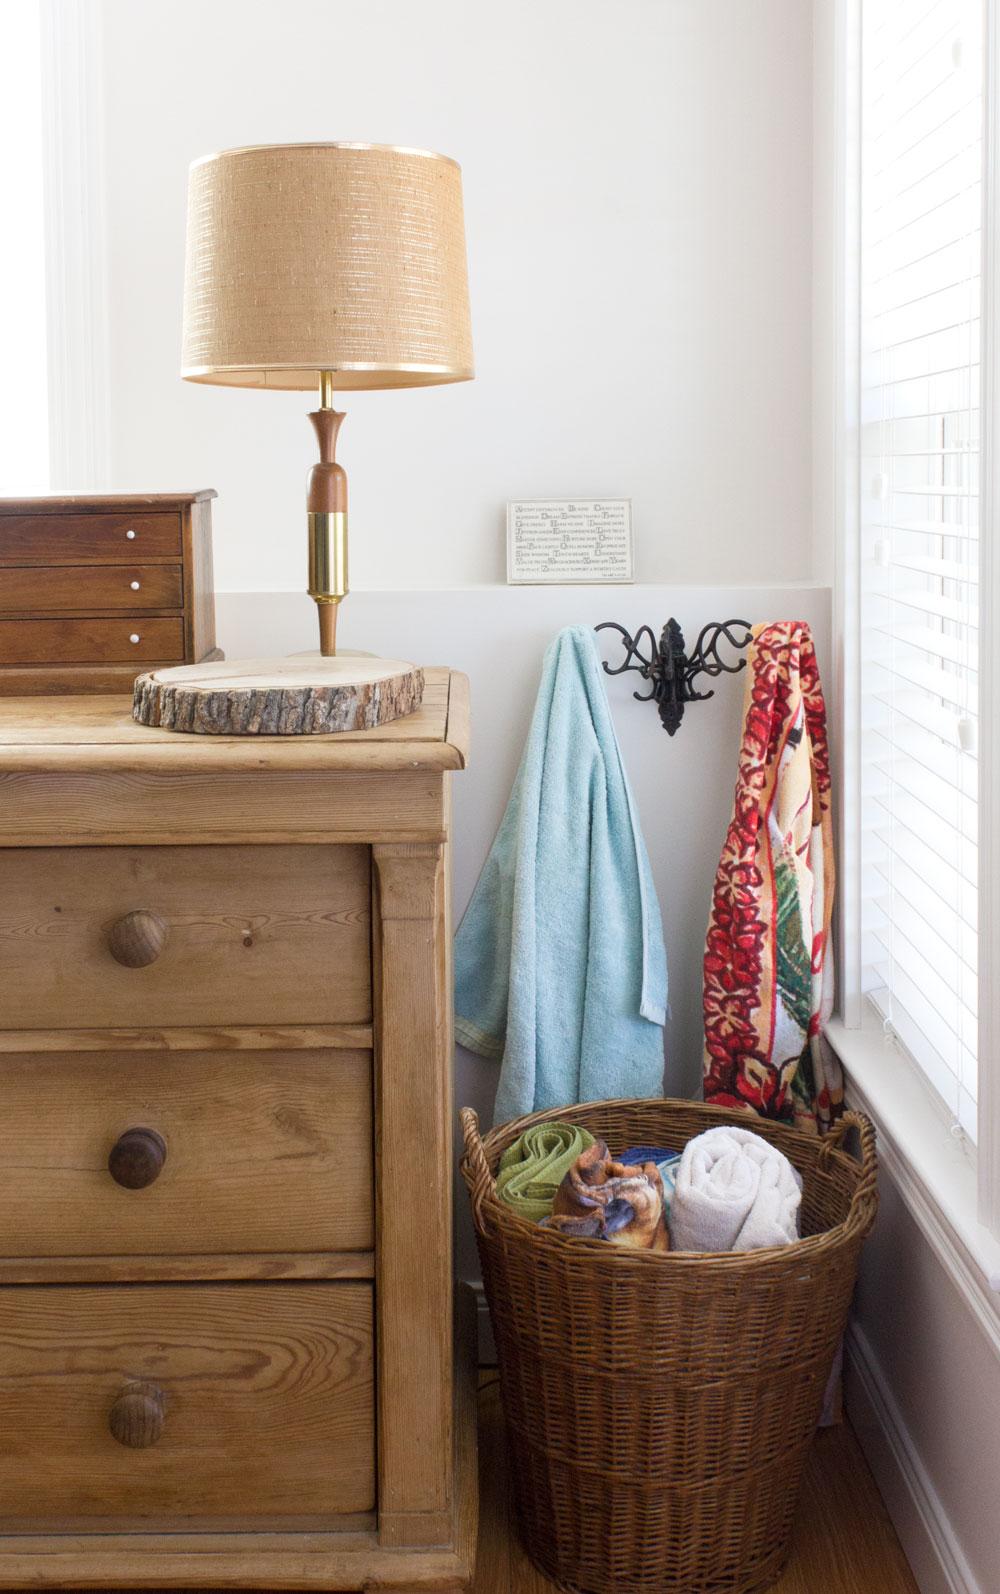 antique rack for hanging towels